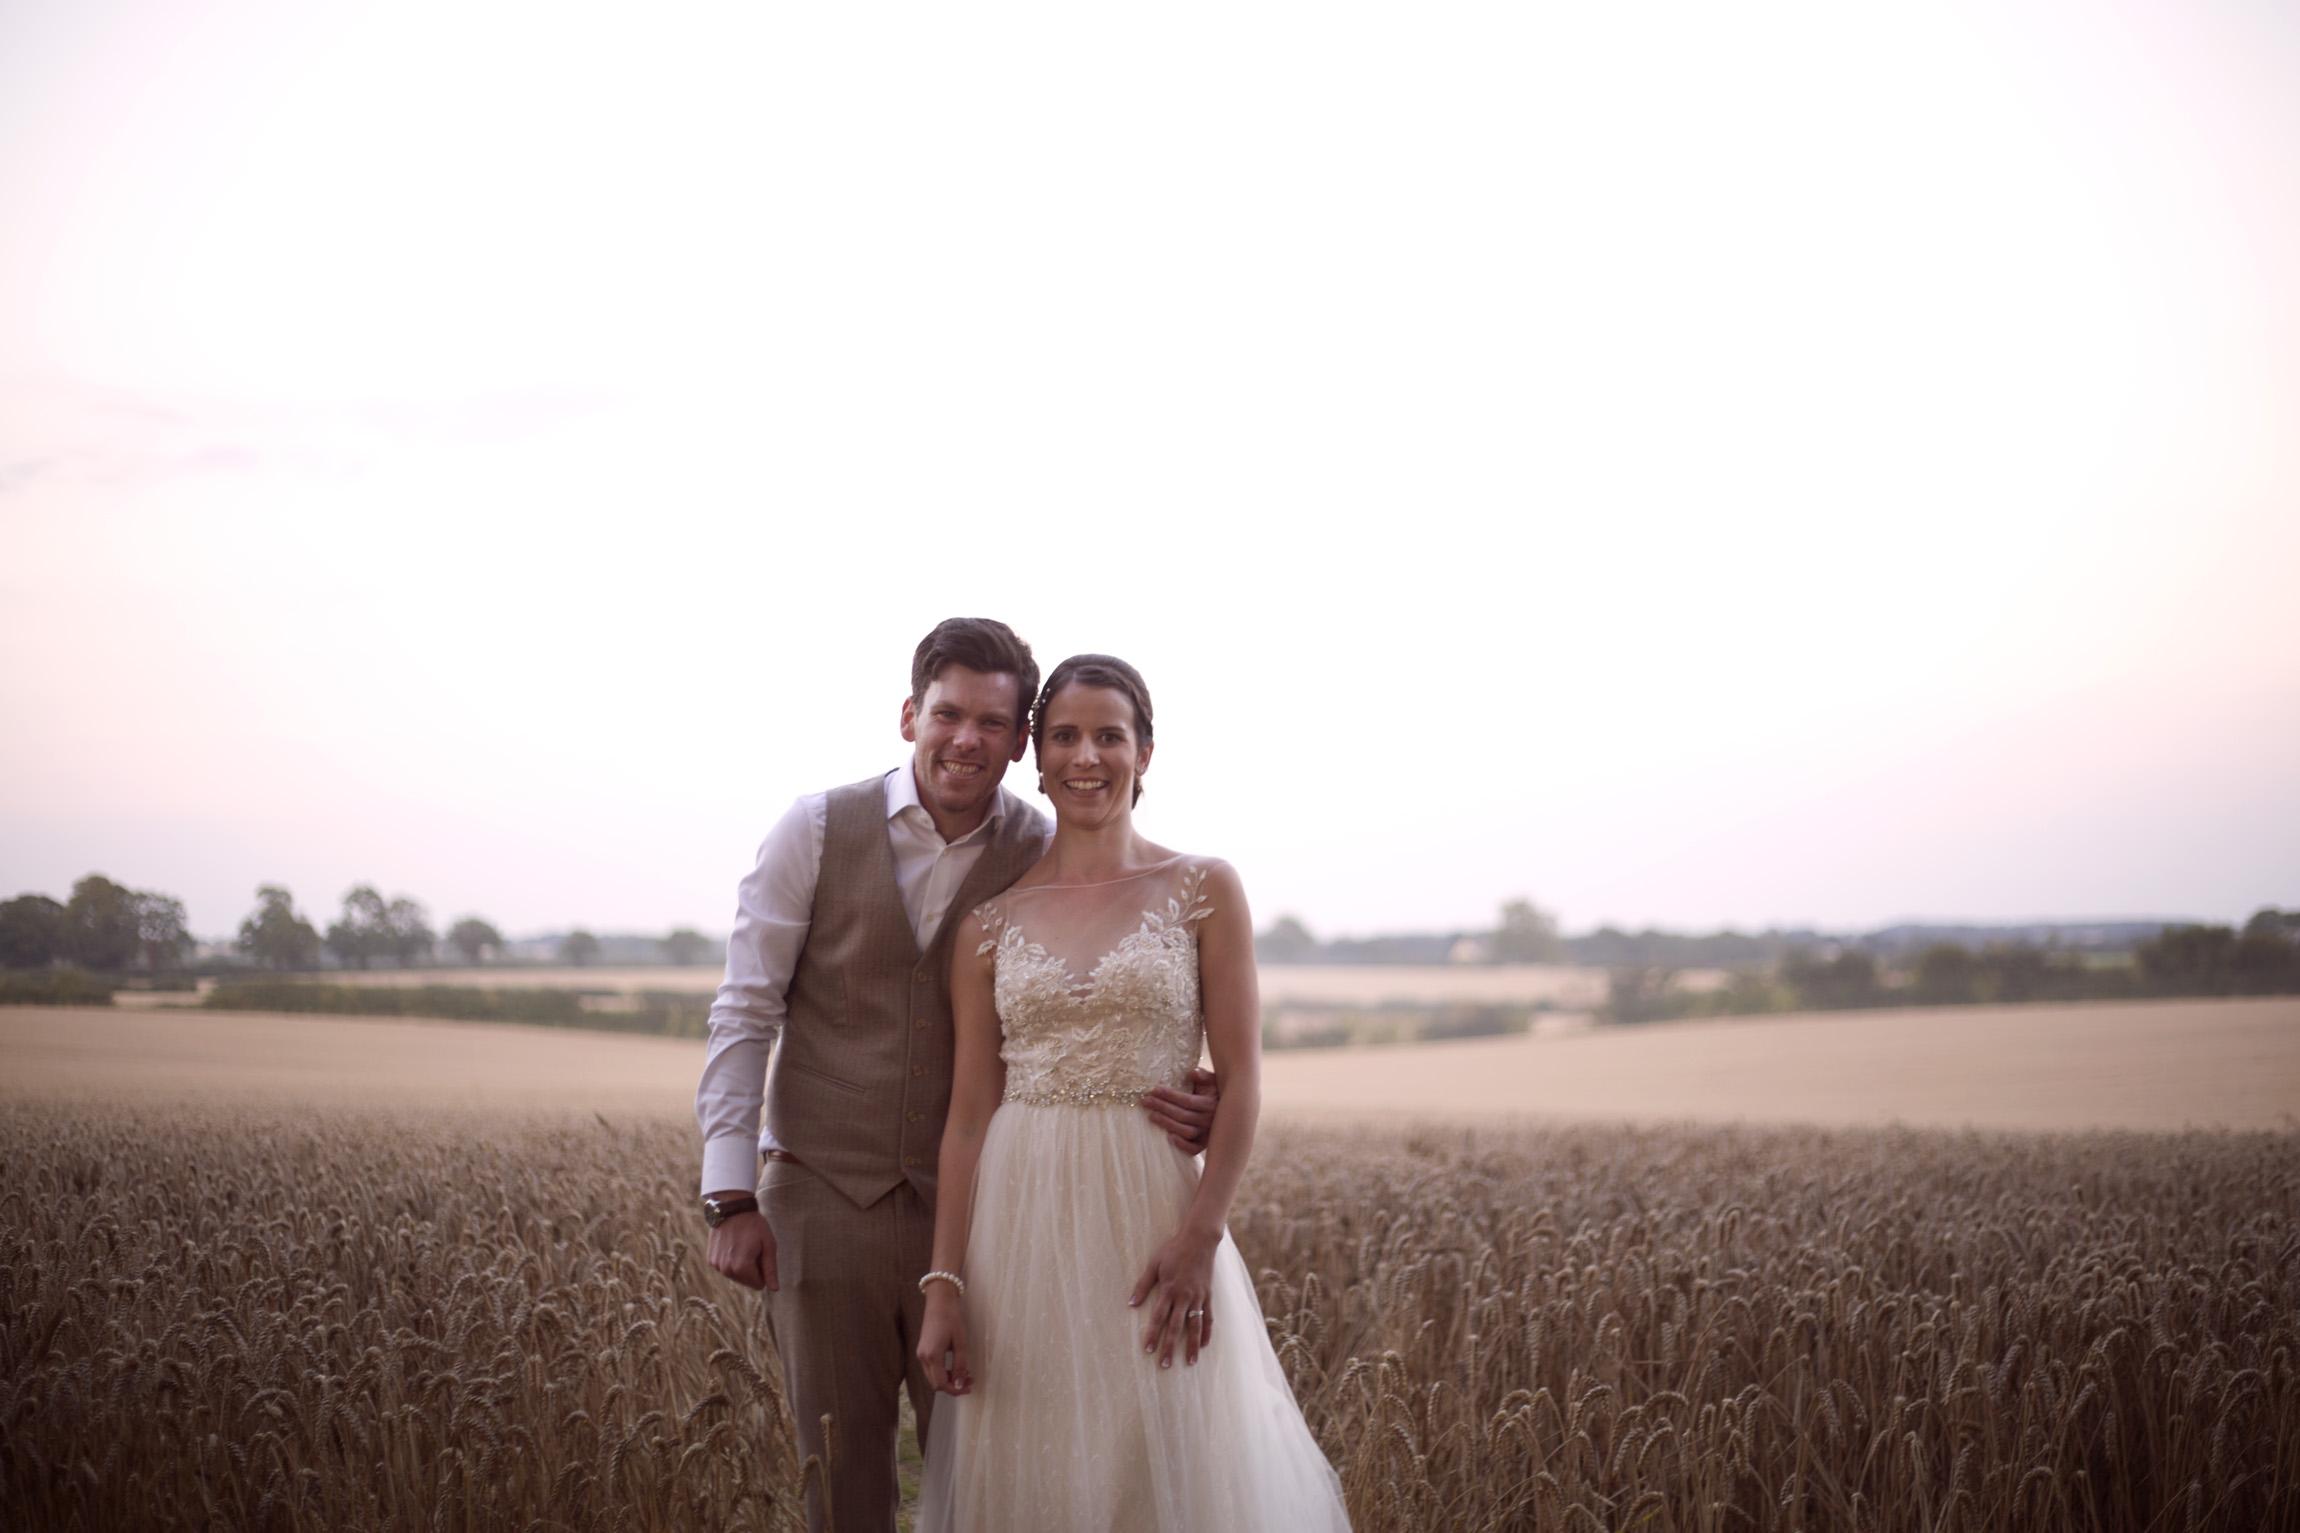 Smiling bride and groom portrait shoot in cornfield Cripps barn outdoor wedding photographer